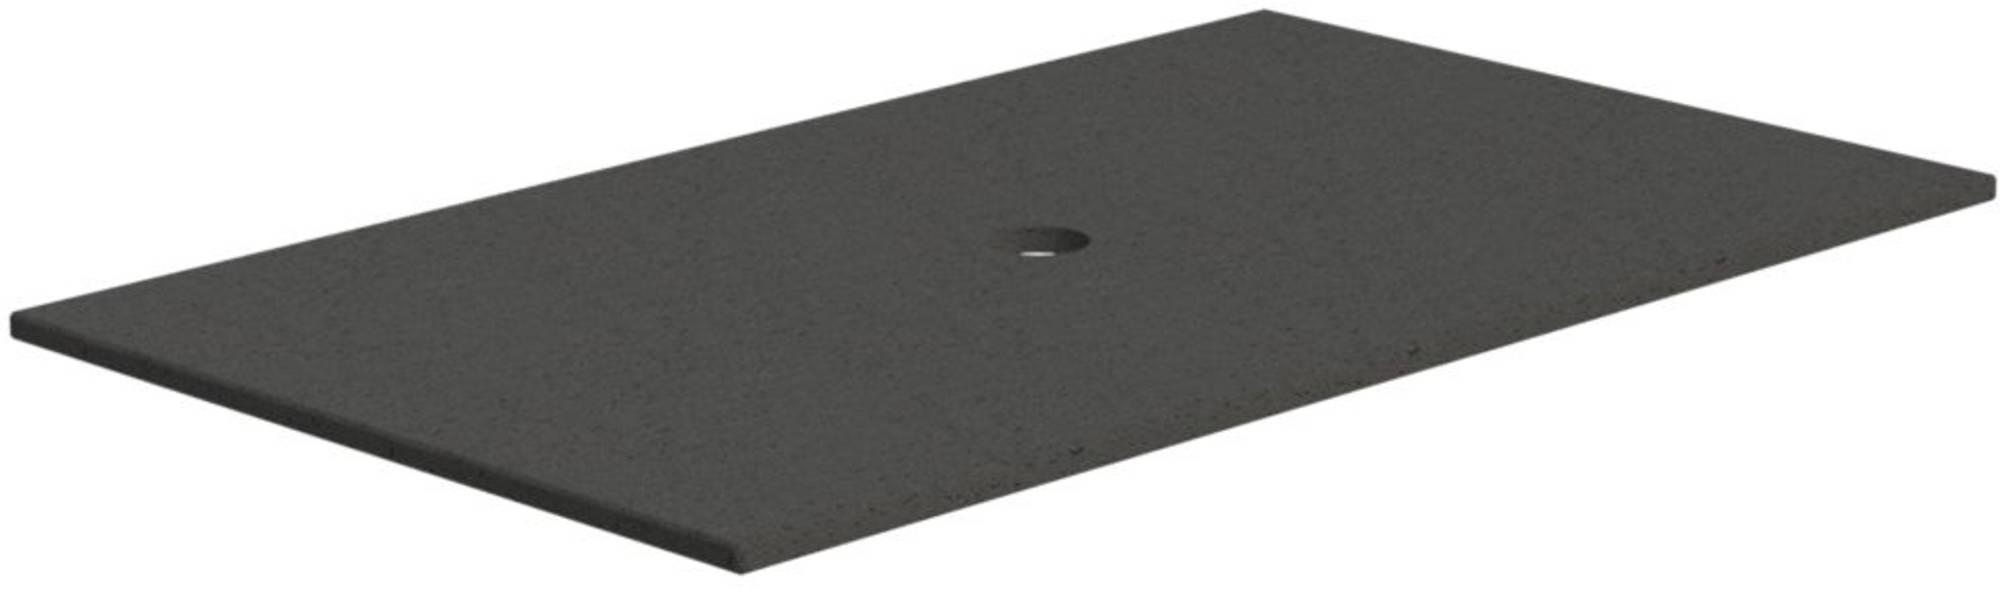 Thebalux Stone 1 Afdekblad HPL 83x48,5x3,8 cm Bardolino Eiken